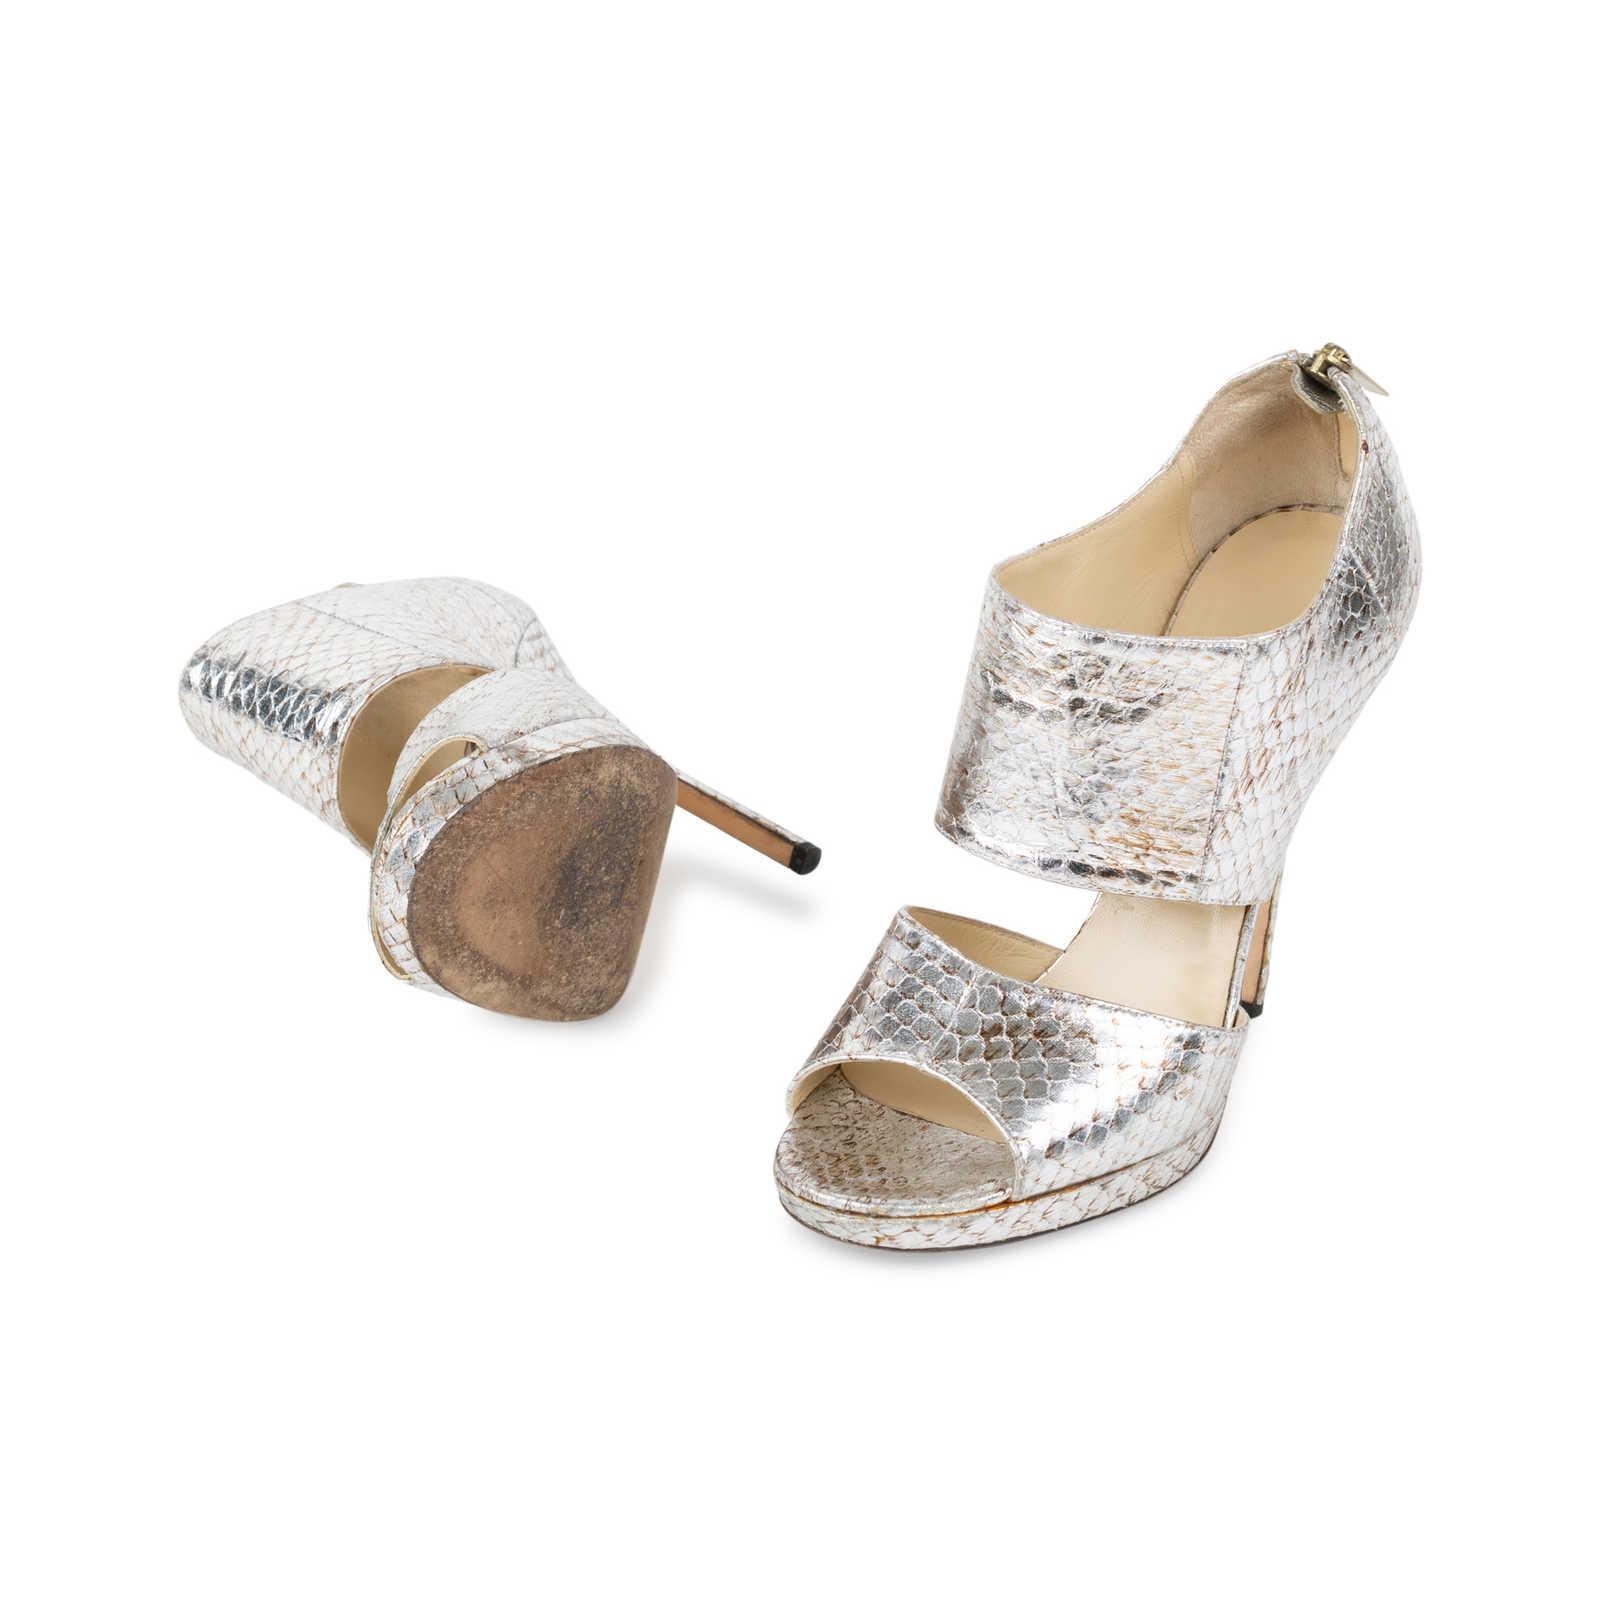 88c07deaf ... Authentic Second Hand Jimmy Choo Zipped Elaphe Snake Sandals  (PSS-557-00008) ...